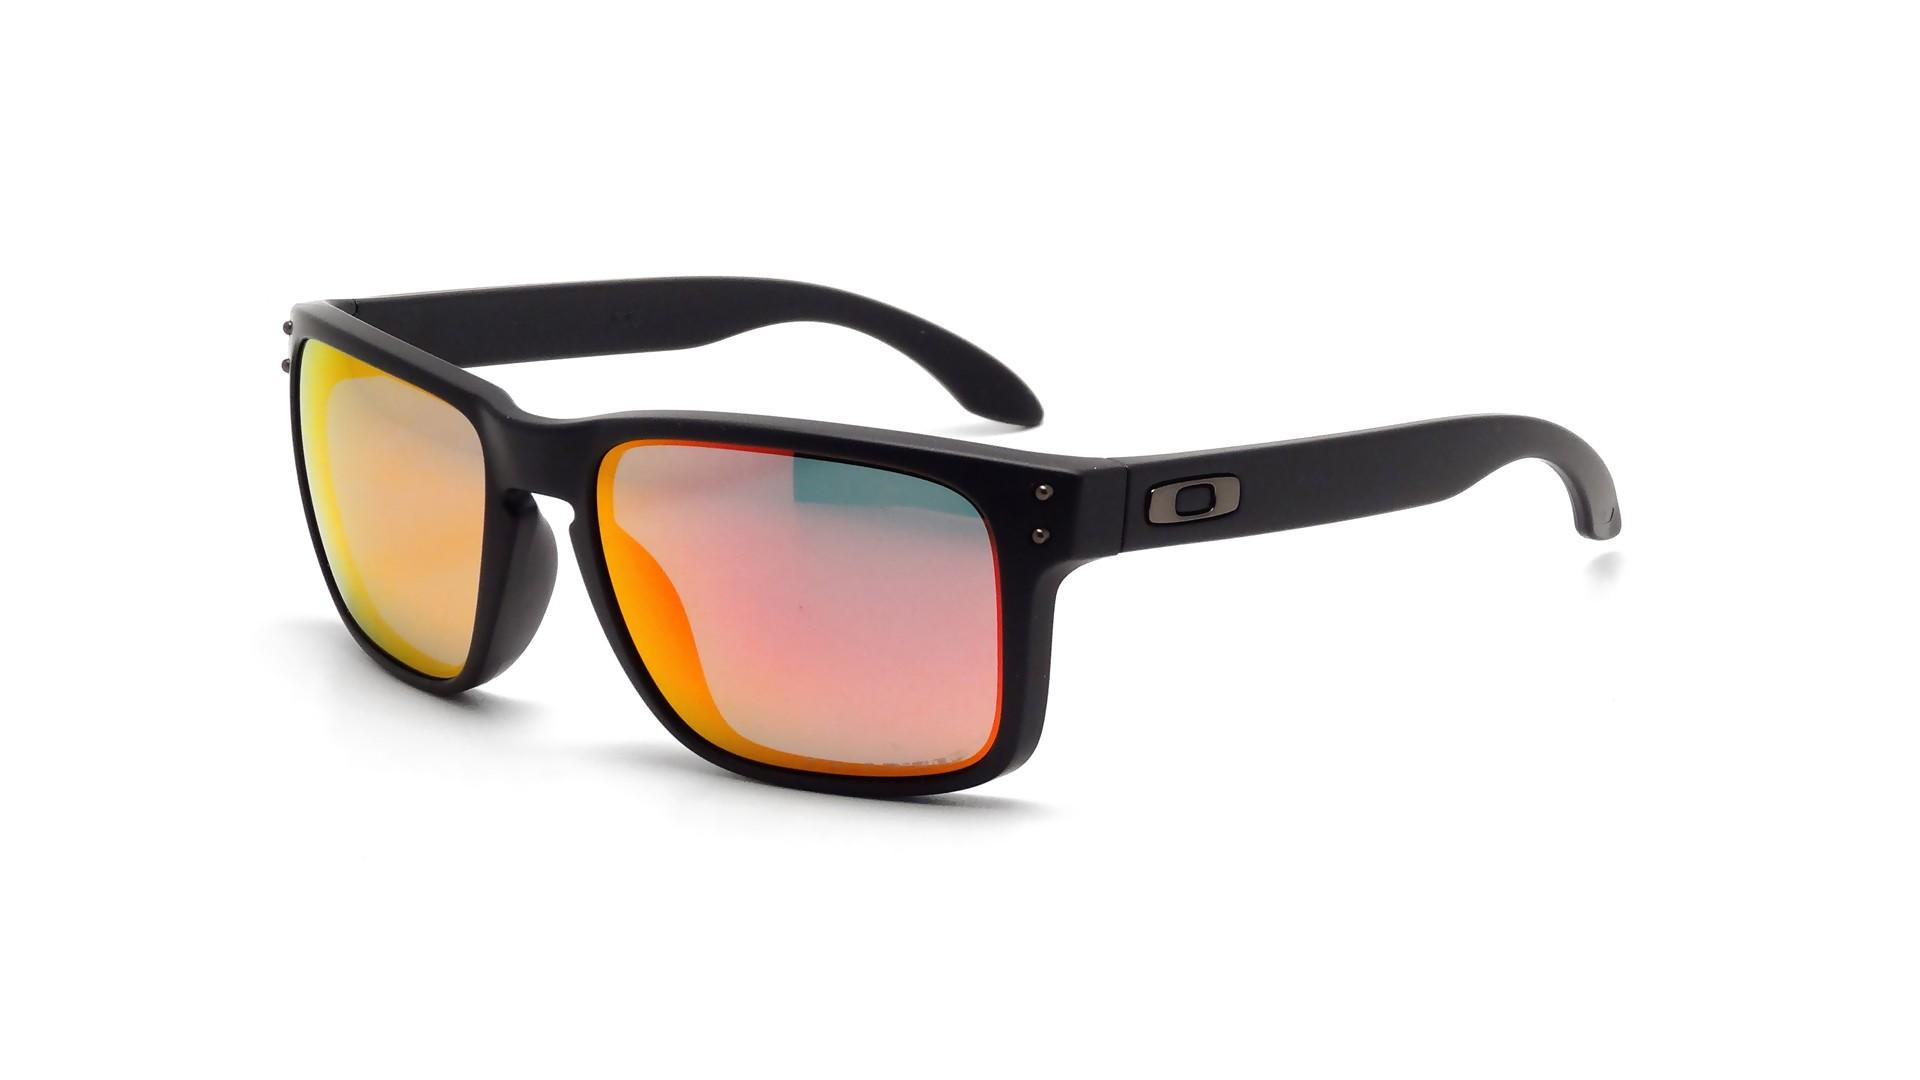 aa261e5dfc Sunglasses Oakley Holbrook Black Matte Iridium OO9102 51 55-18 Medium Polarized  Mirror